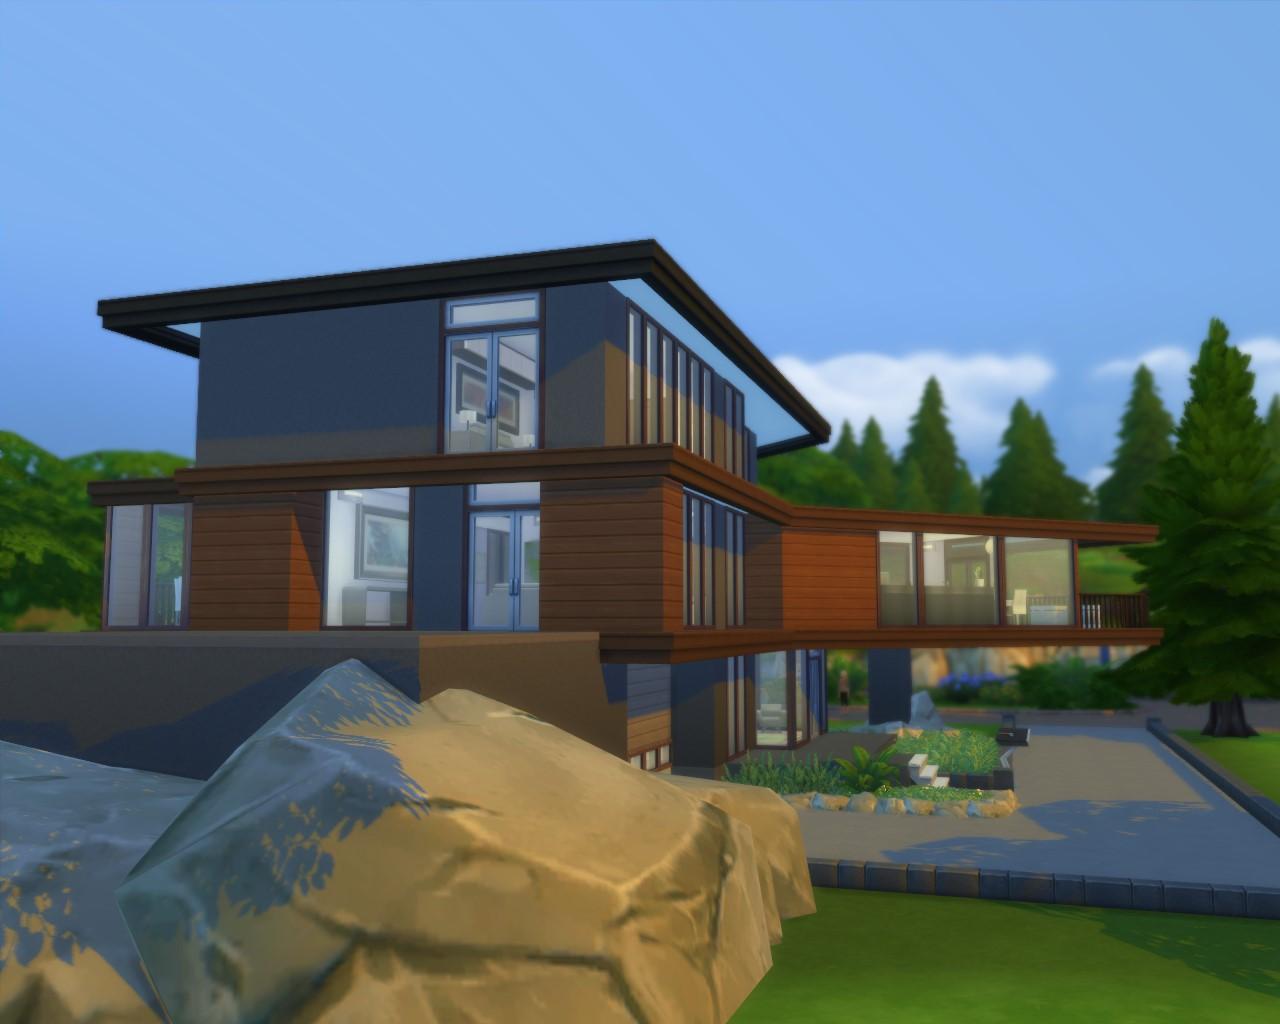 Mod The Sims - Cullen House